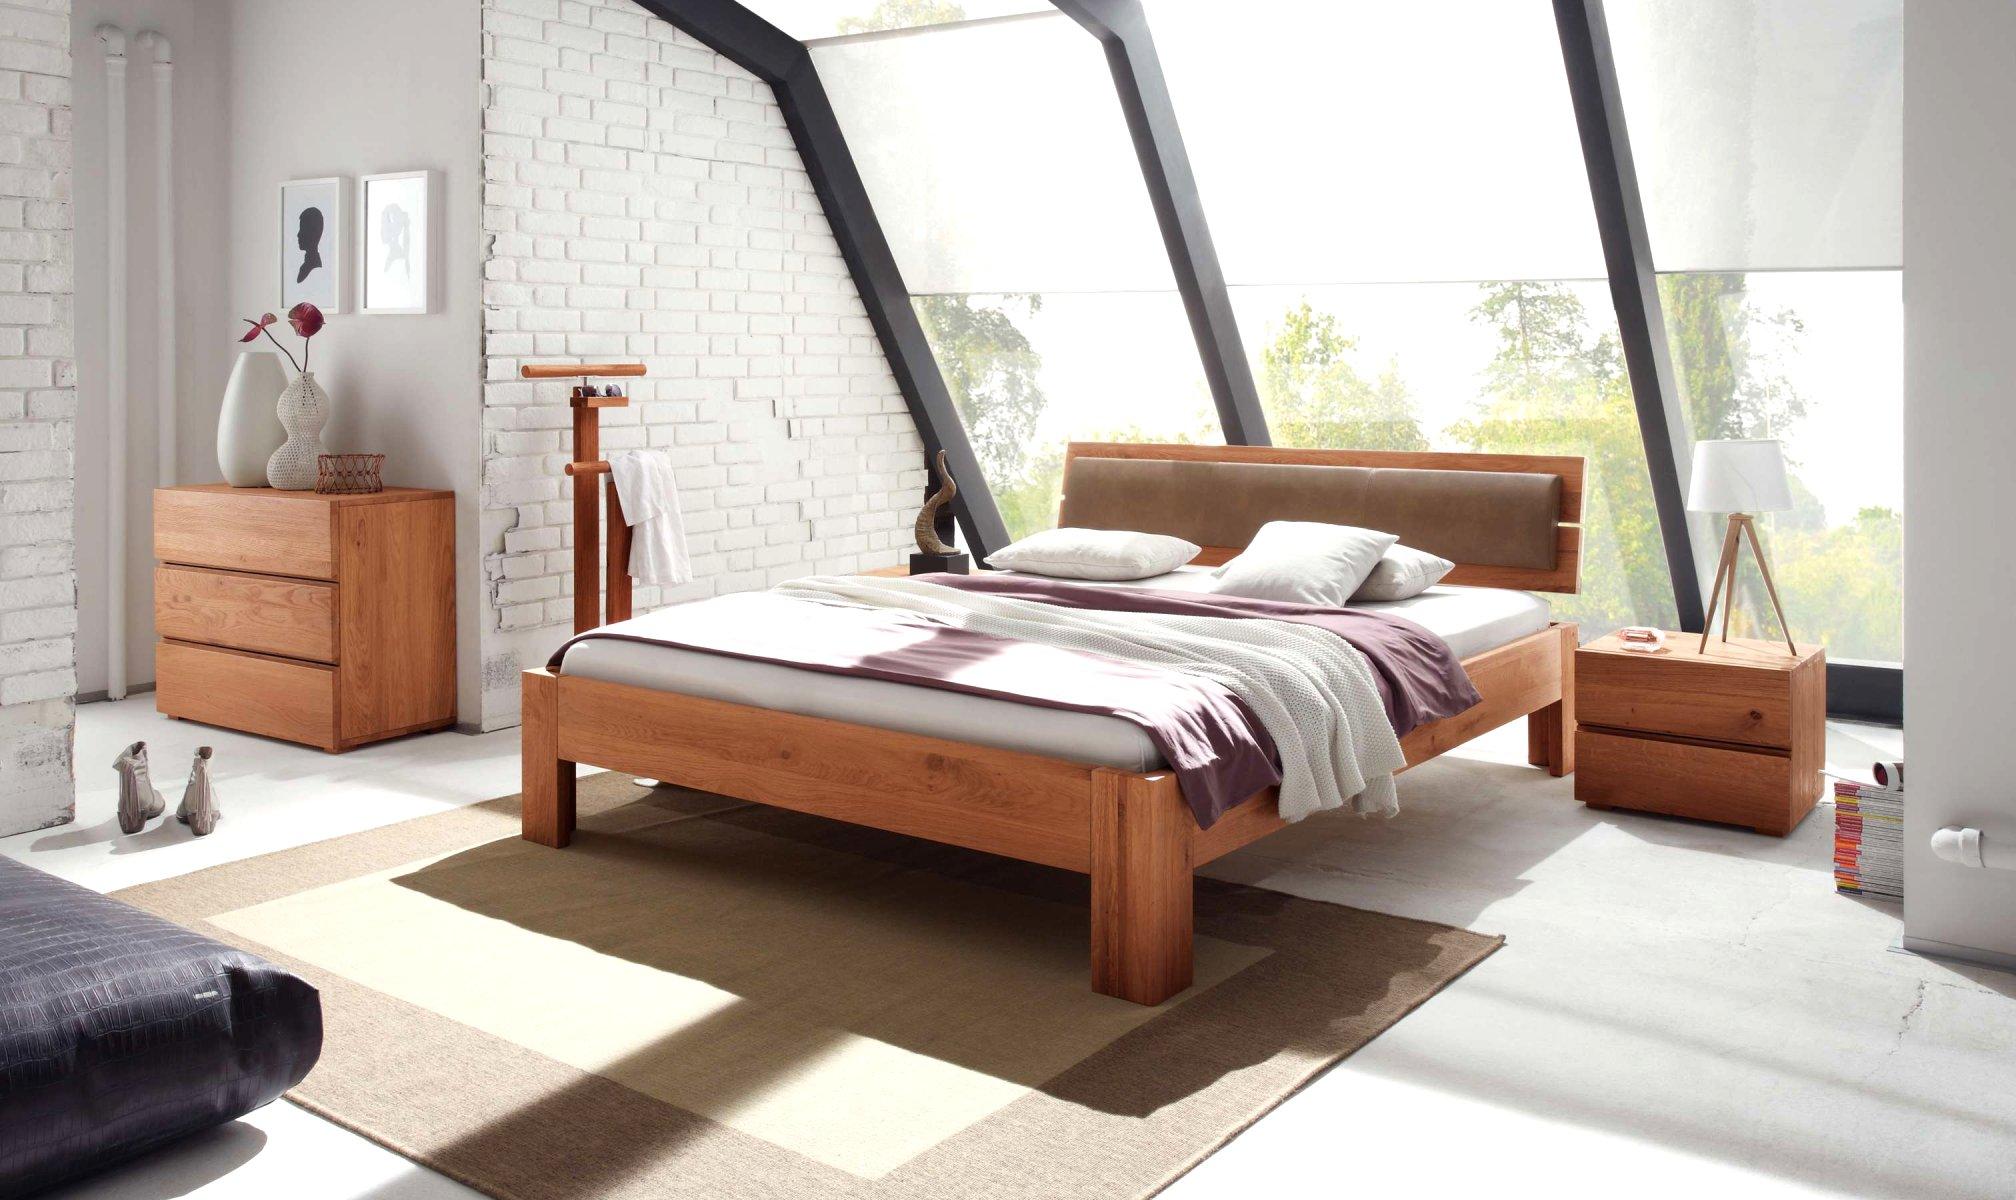 lit hasena oak line meubles steinmetz. Black Bedroom Furniture Sets. Home Design Ideas